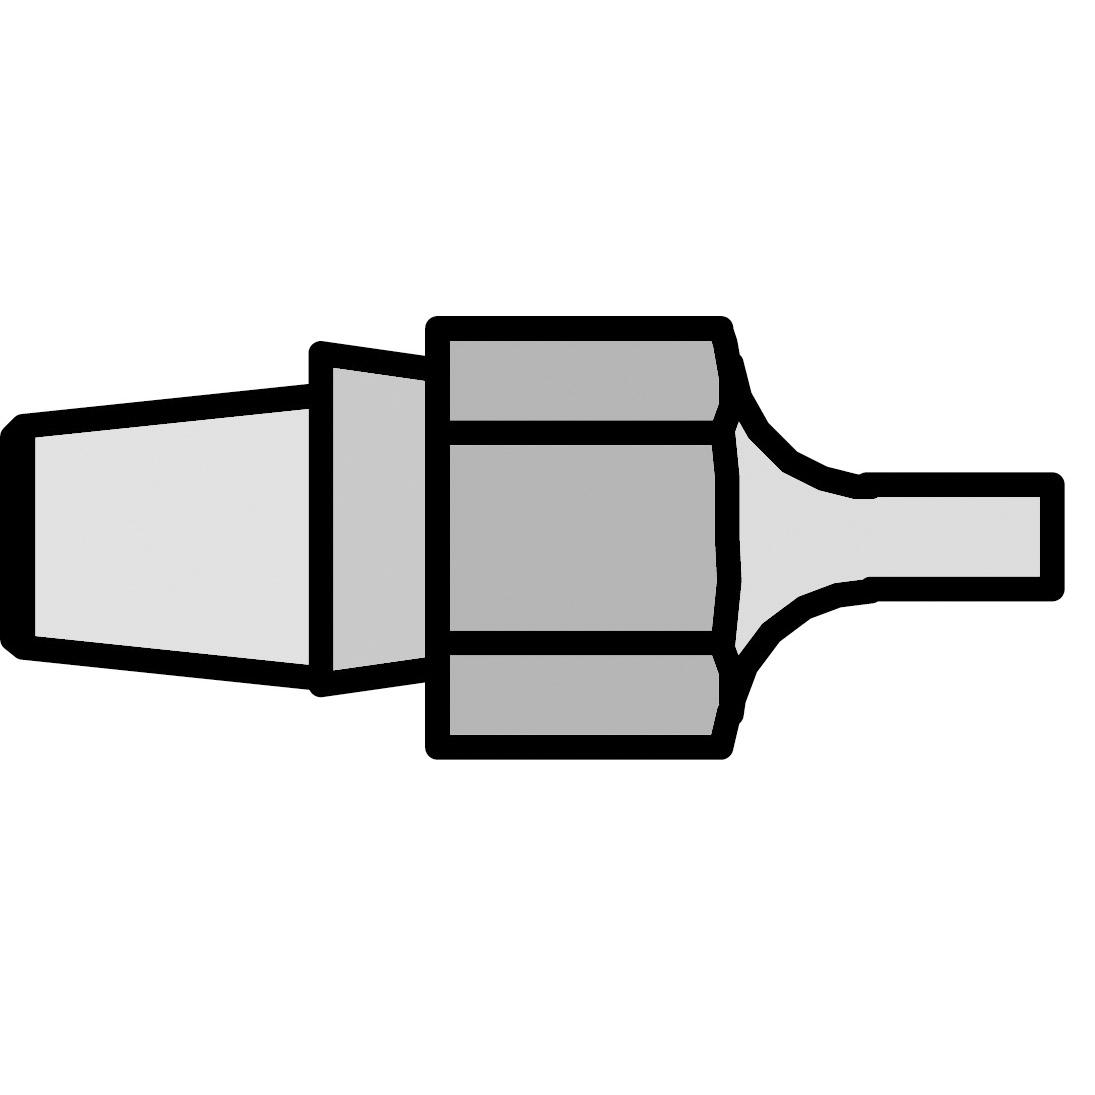 DX 120 Desoldering Nozzle